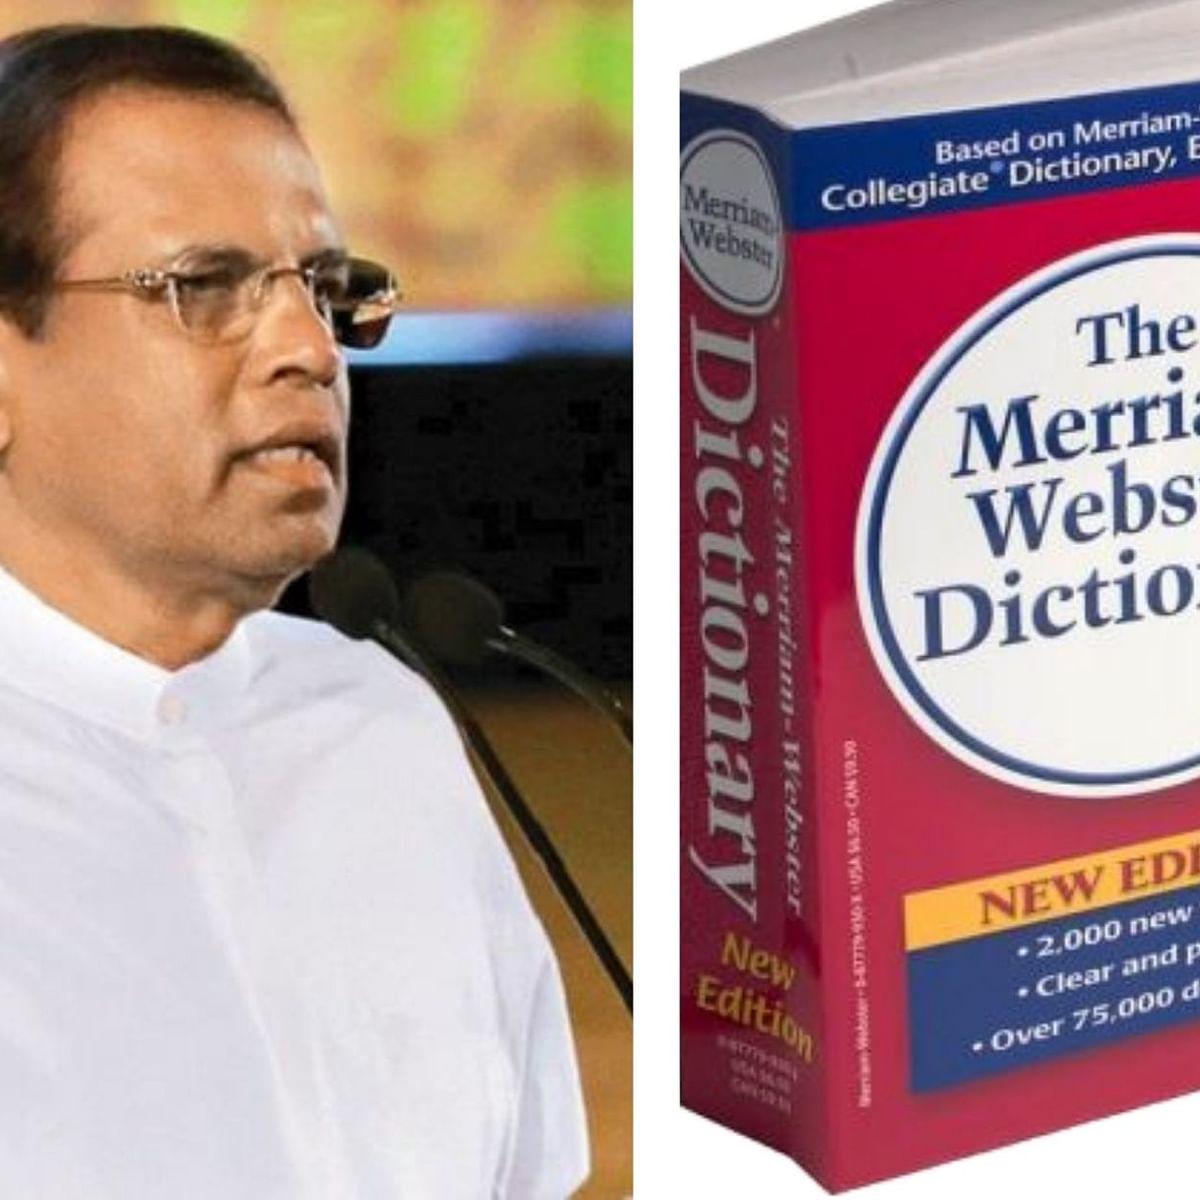 Former Sri Lankan President Maithripala Sirisena's wife was addressed as M.R.S Sirisena instead of Mrs Sirisena by PM Modi in 2015 in a huge gaffe